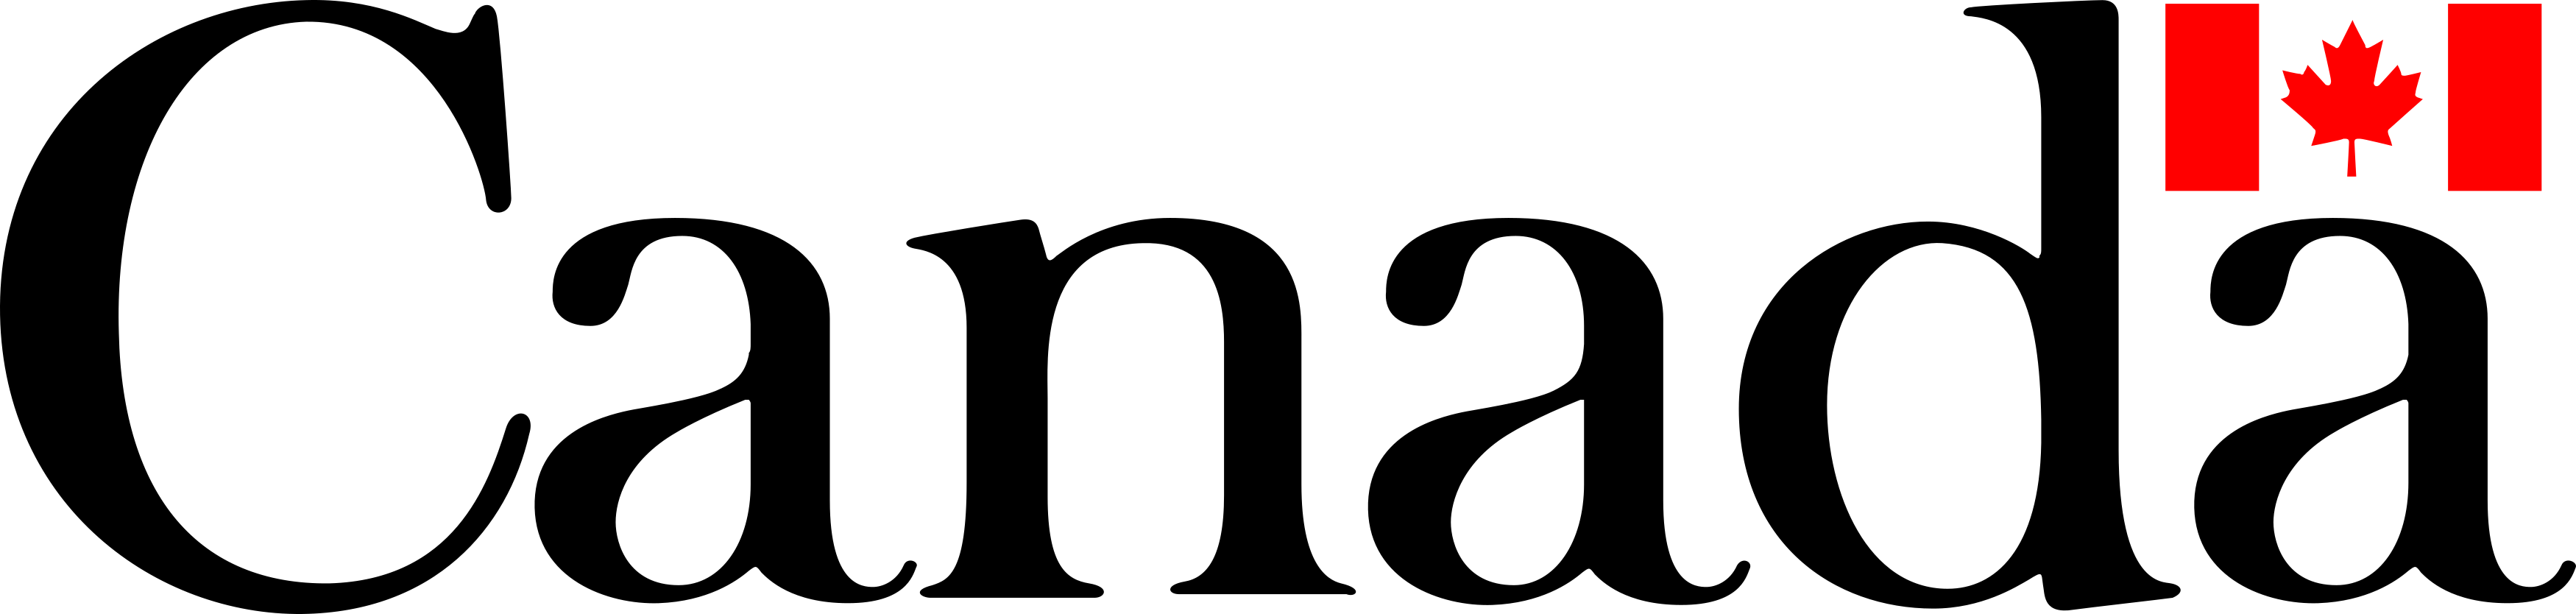 canada logo - Canada Logo